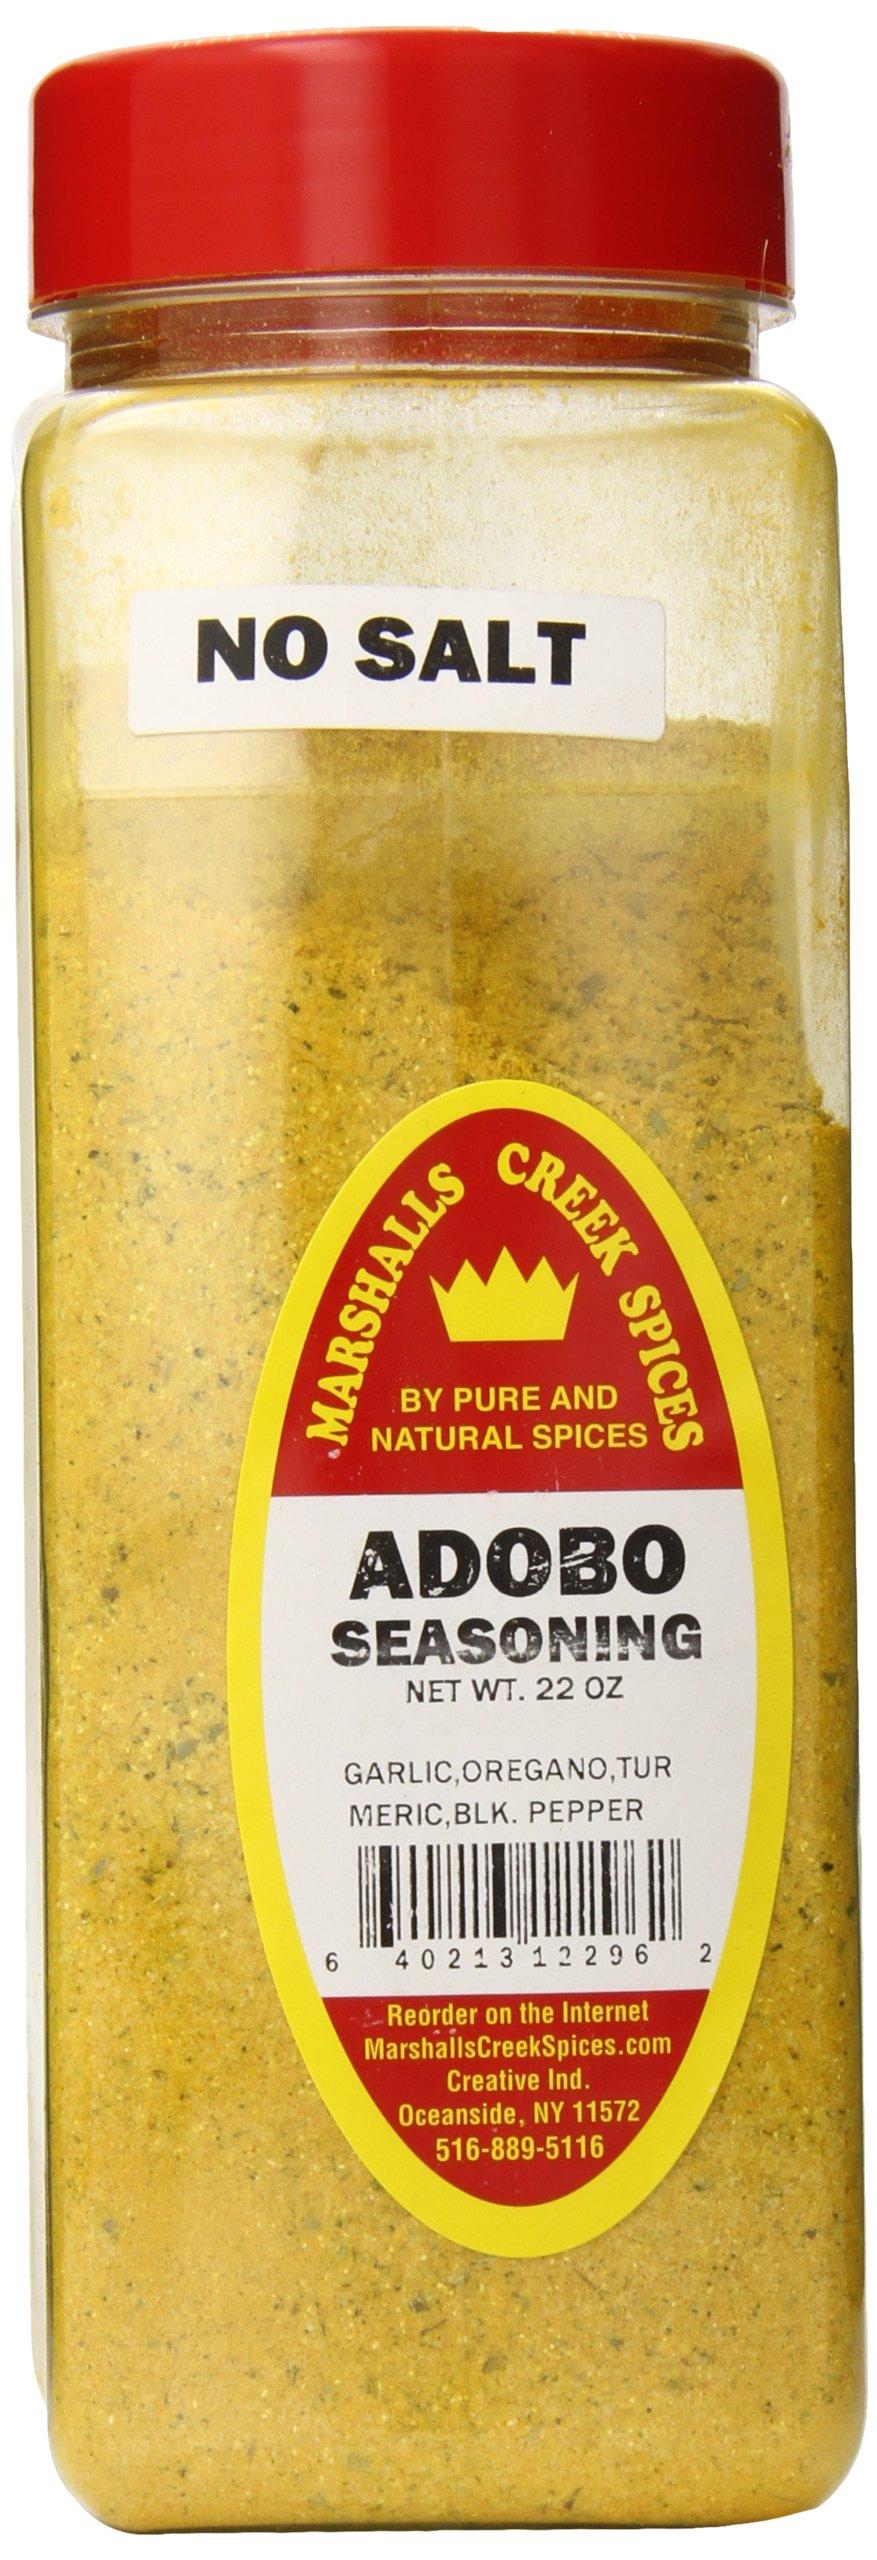 Marshalls Creek Spices Seasoning, Adobo, XL Size, 22 Ounce